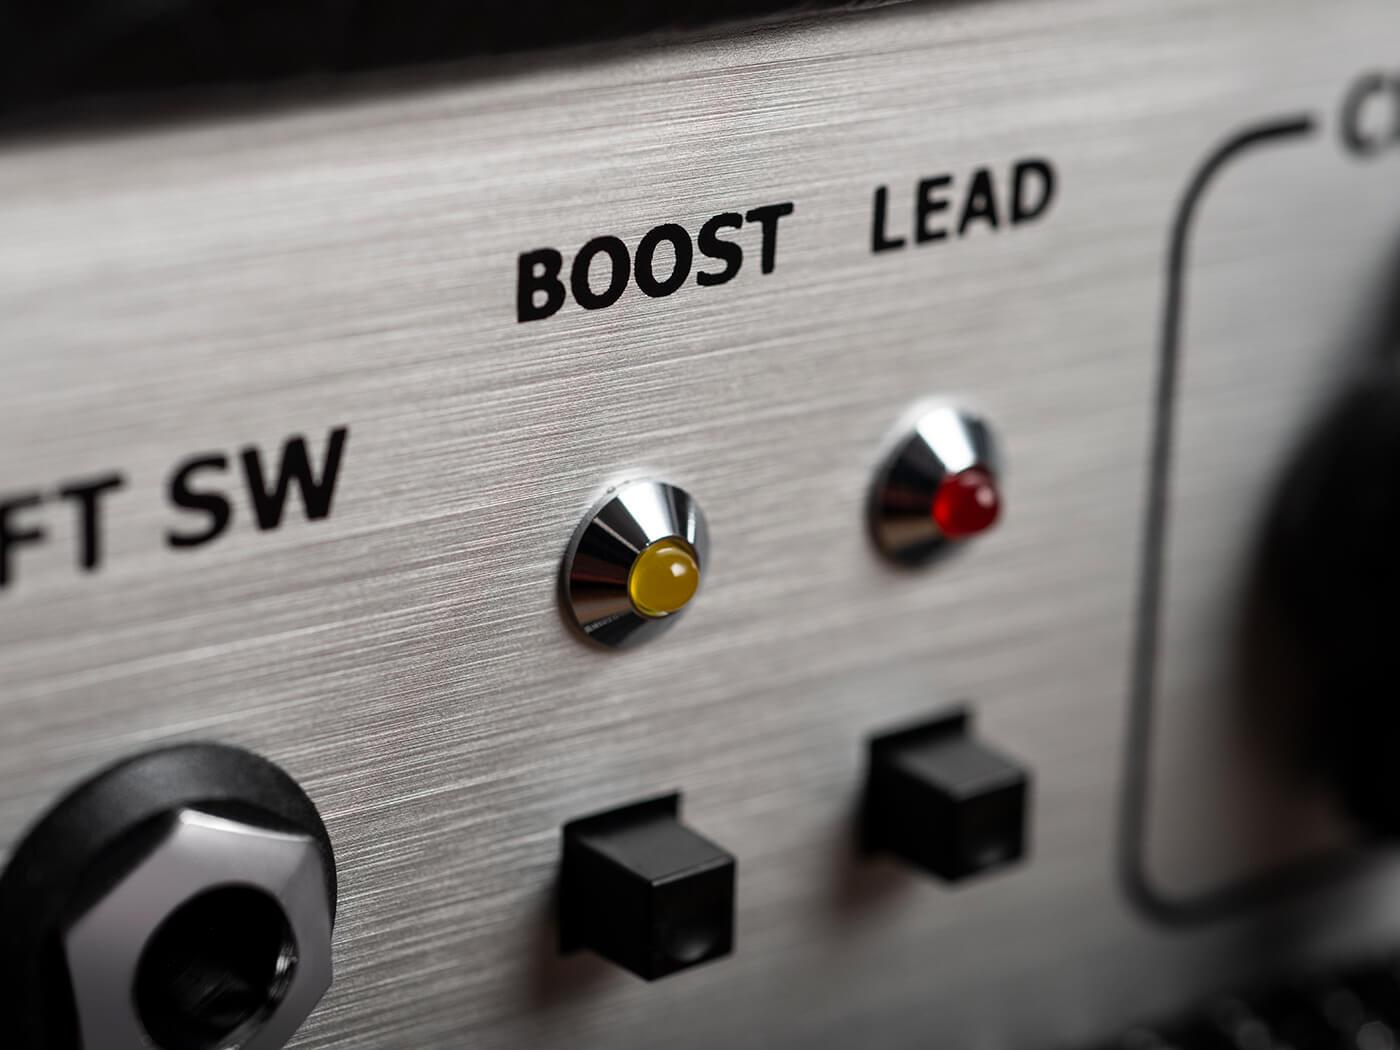 Rajani VOD-50 Boost/Lead